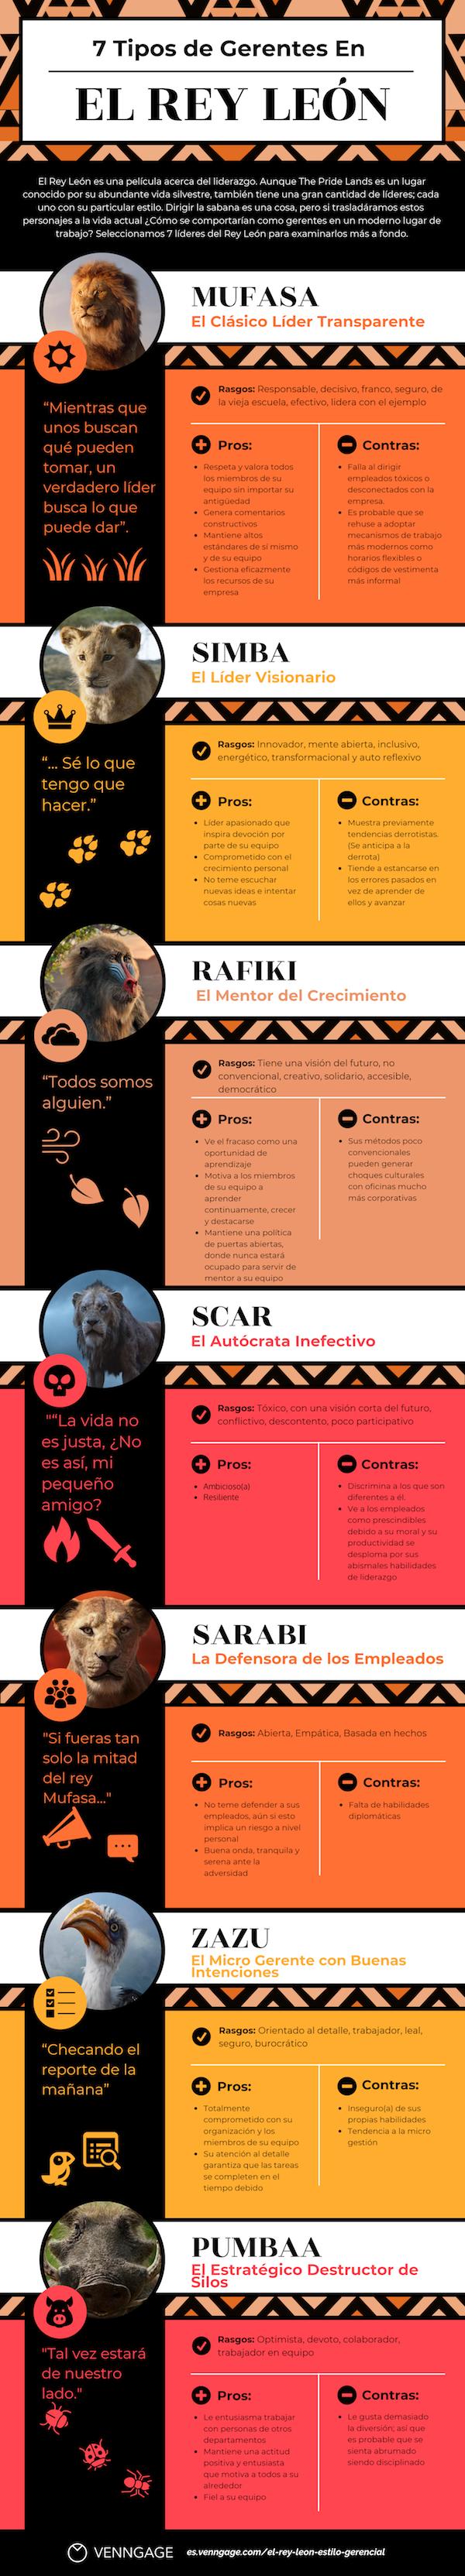 infografia_reyleon